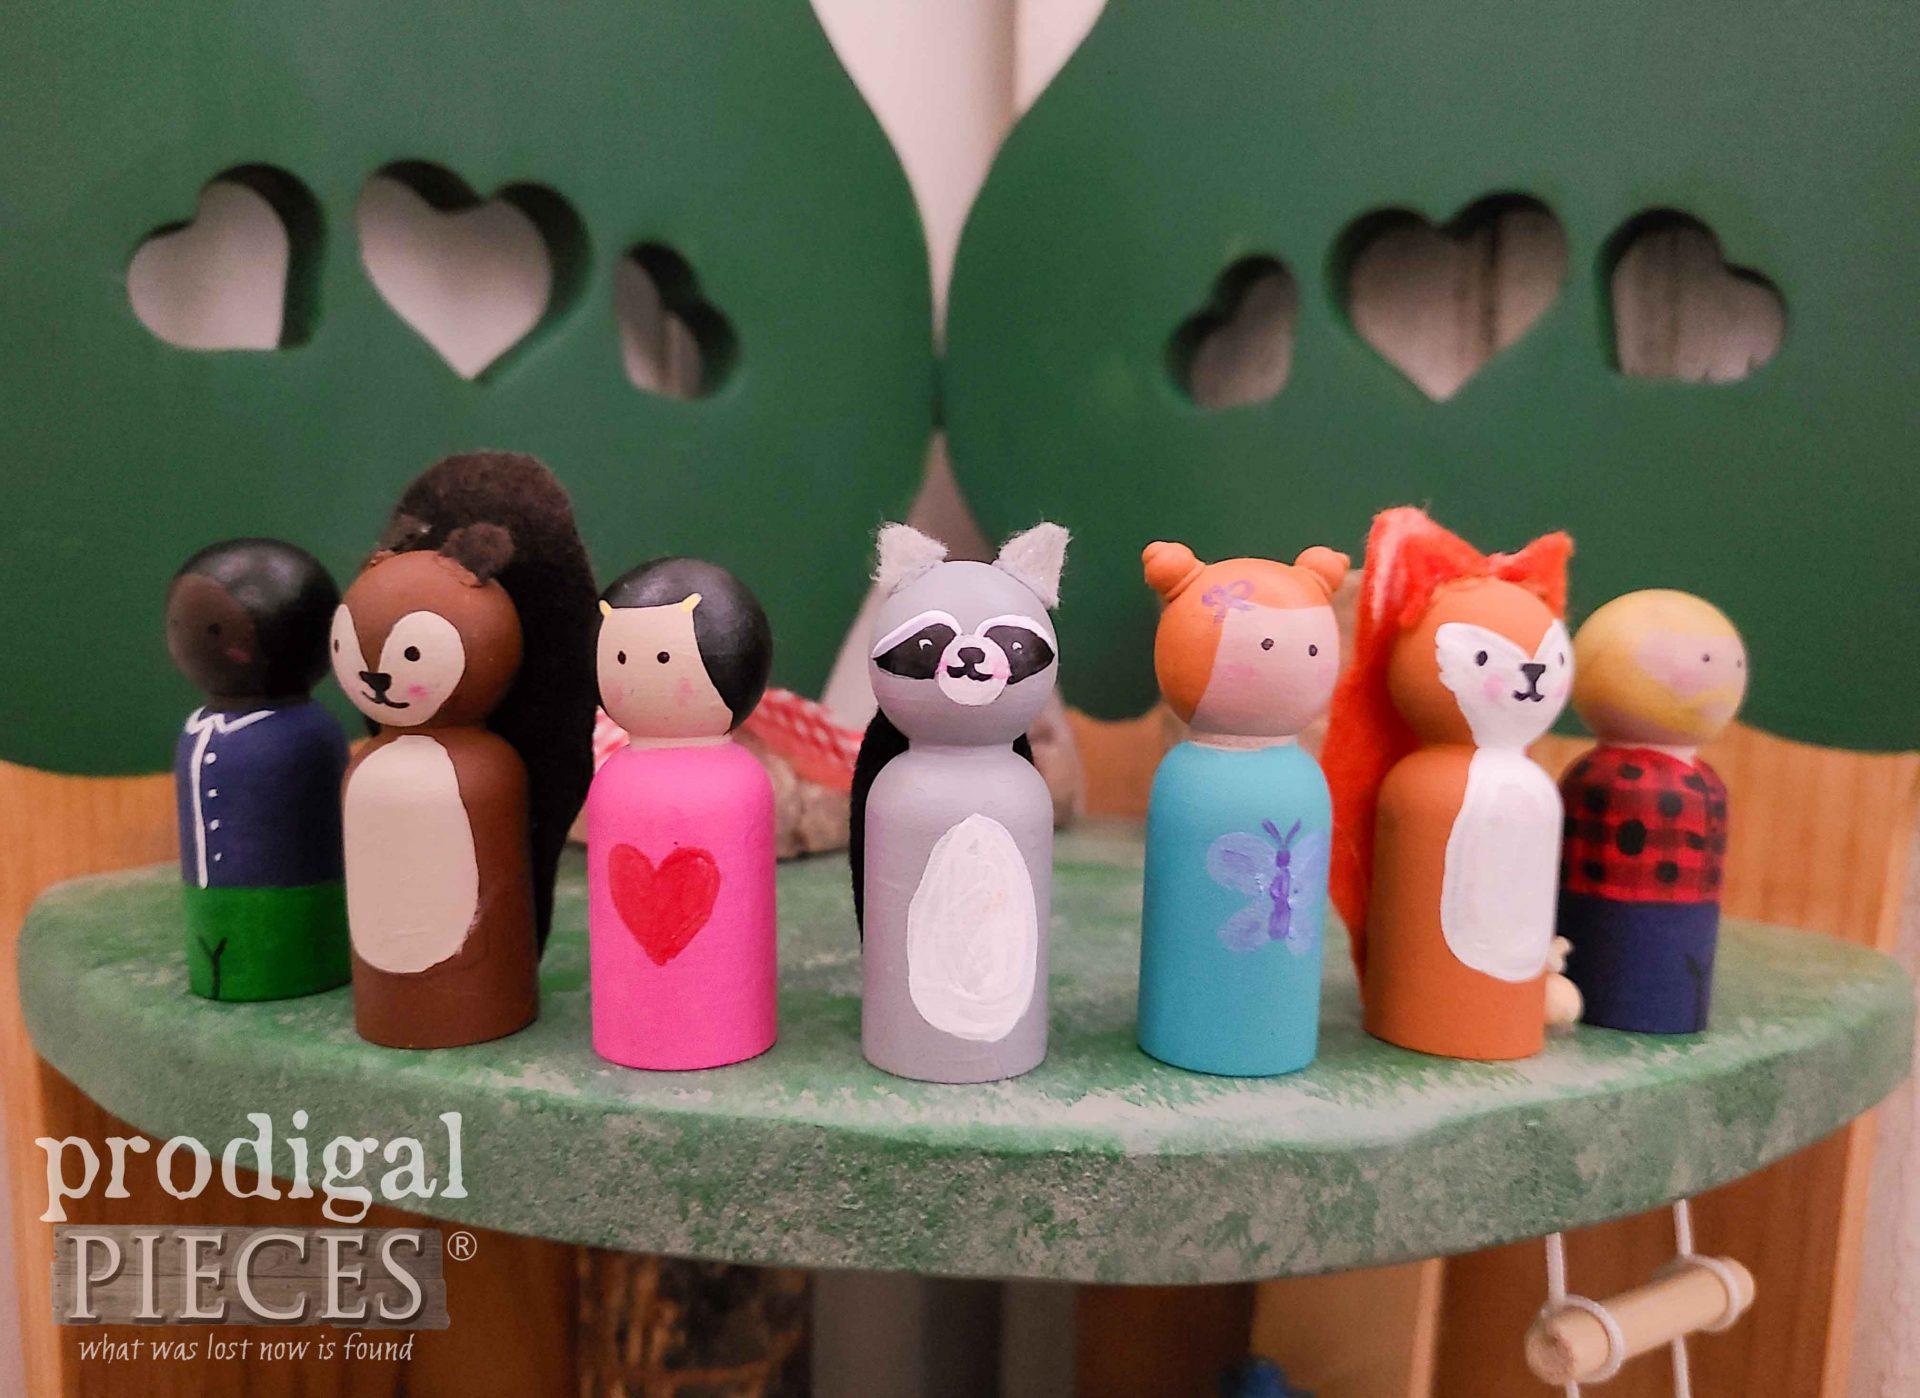 Woodland Peg People Created by Larissa of Prodigal Pieces | prodigalpieces.com #prodigalpieces #handmade #toys #kids #fun